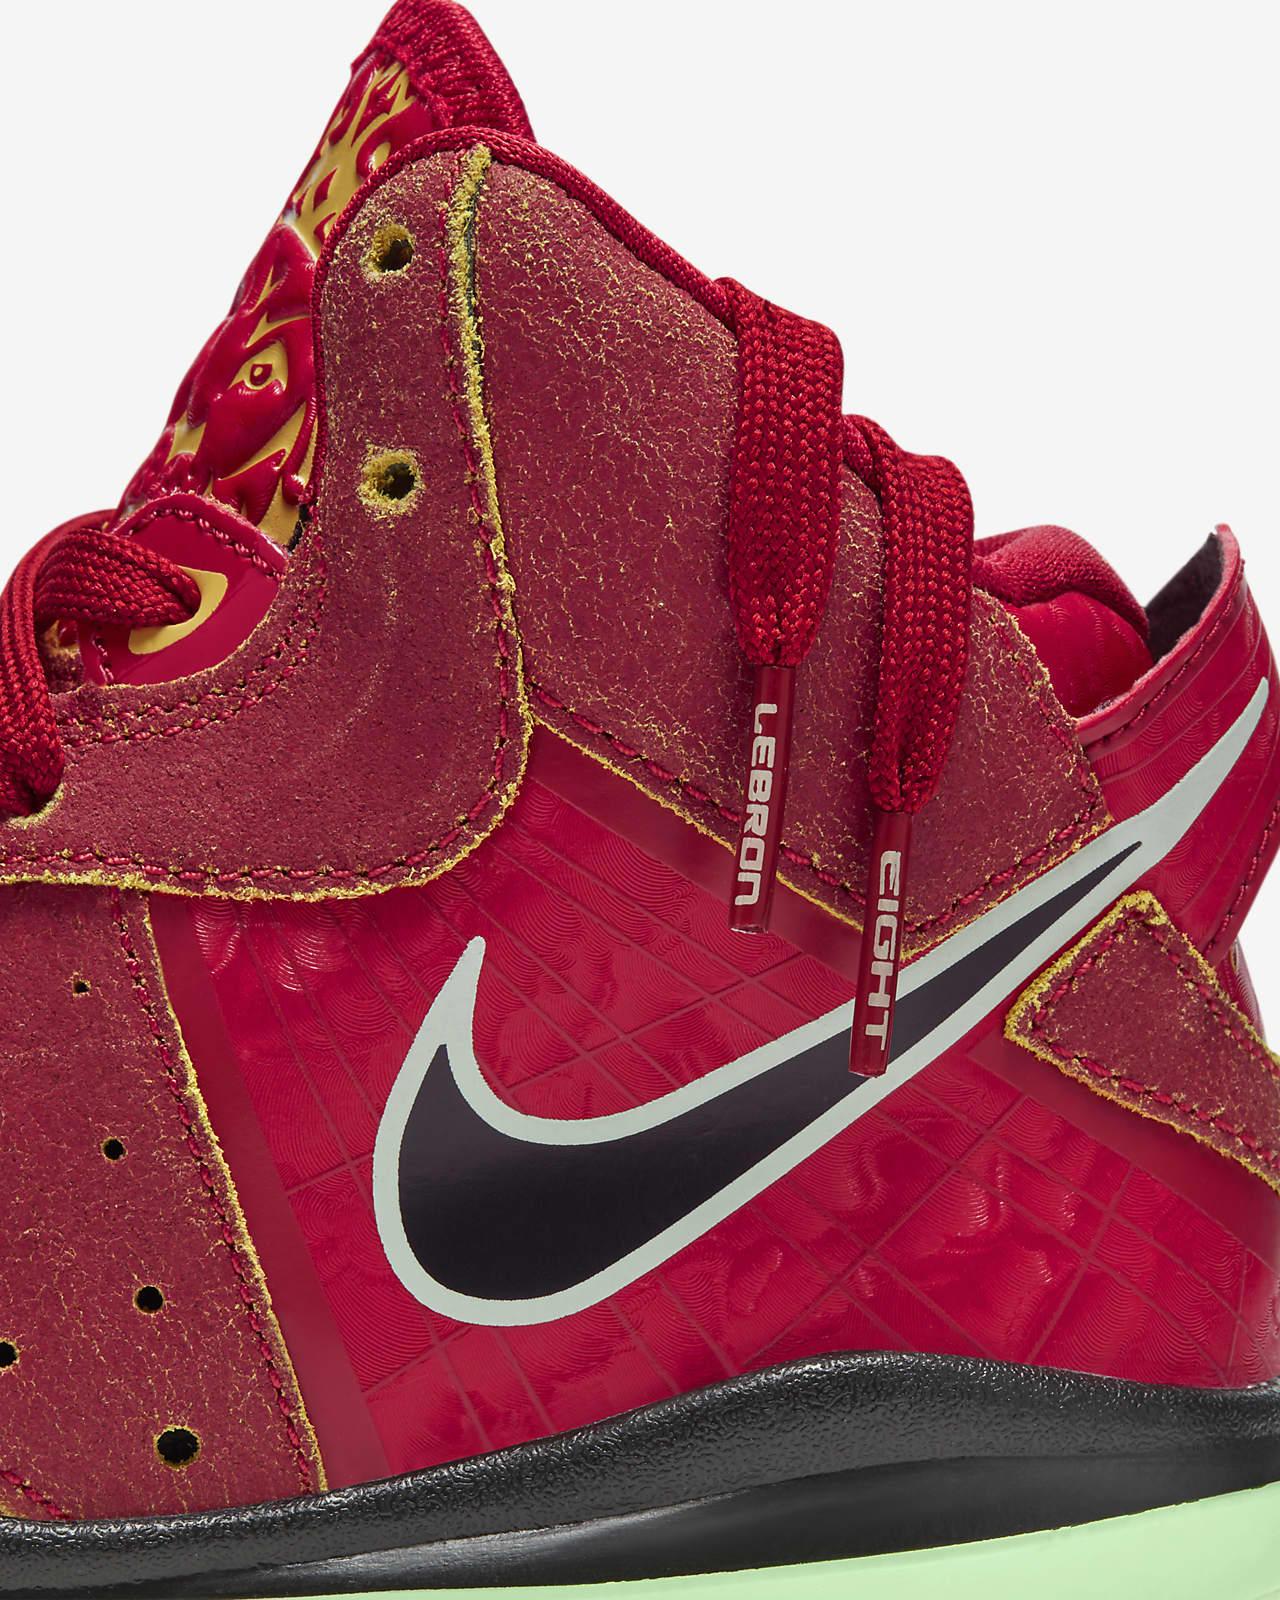 Responder cilindro escolta  Nike LeBron VIII BP 幼童运动童鞋-耐克(Nike)中国官网